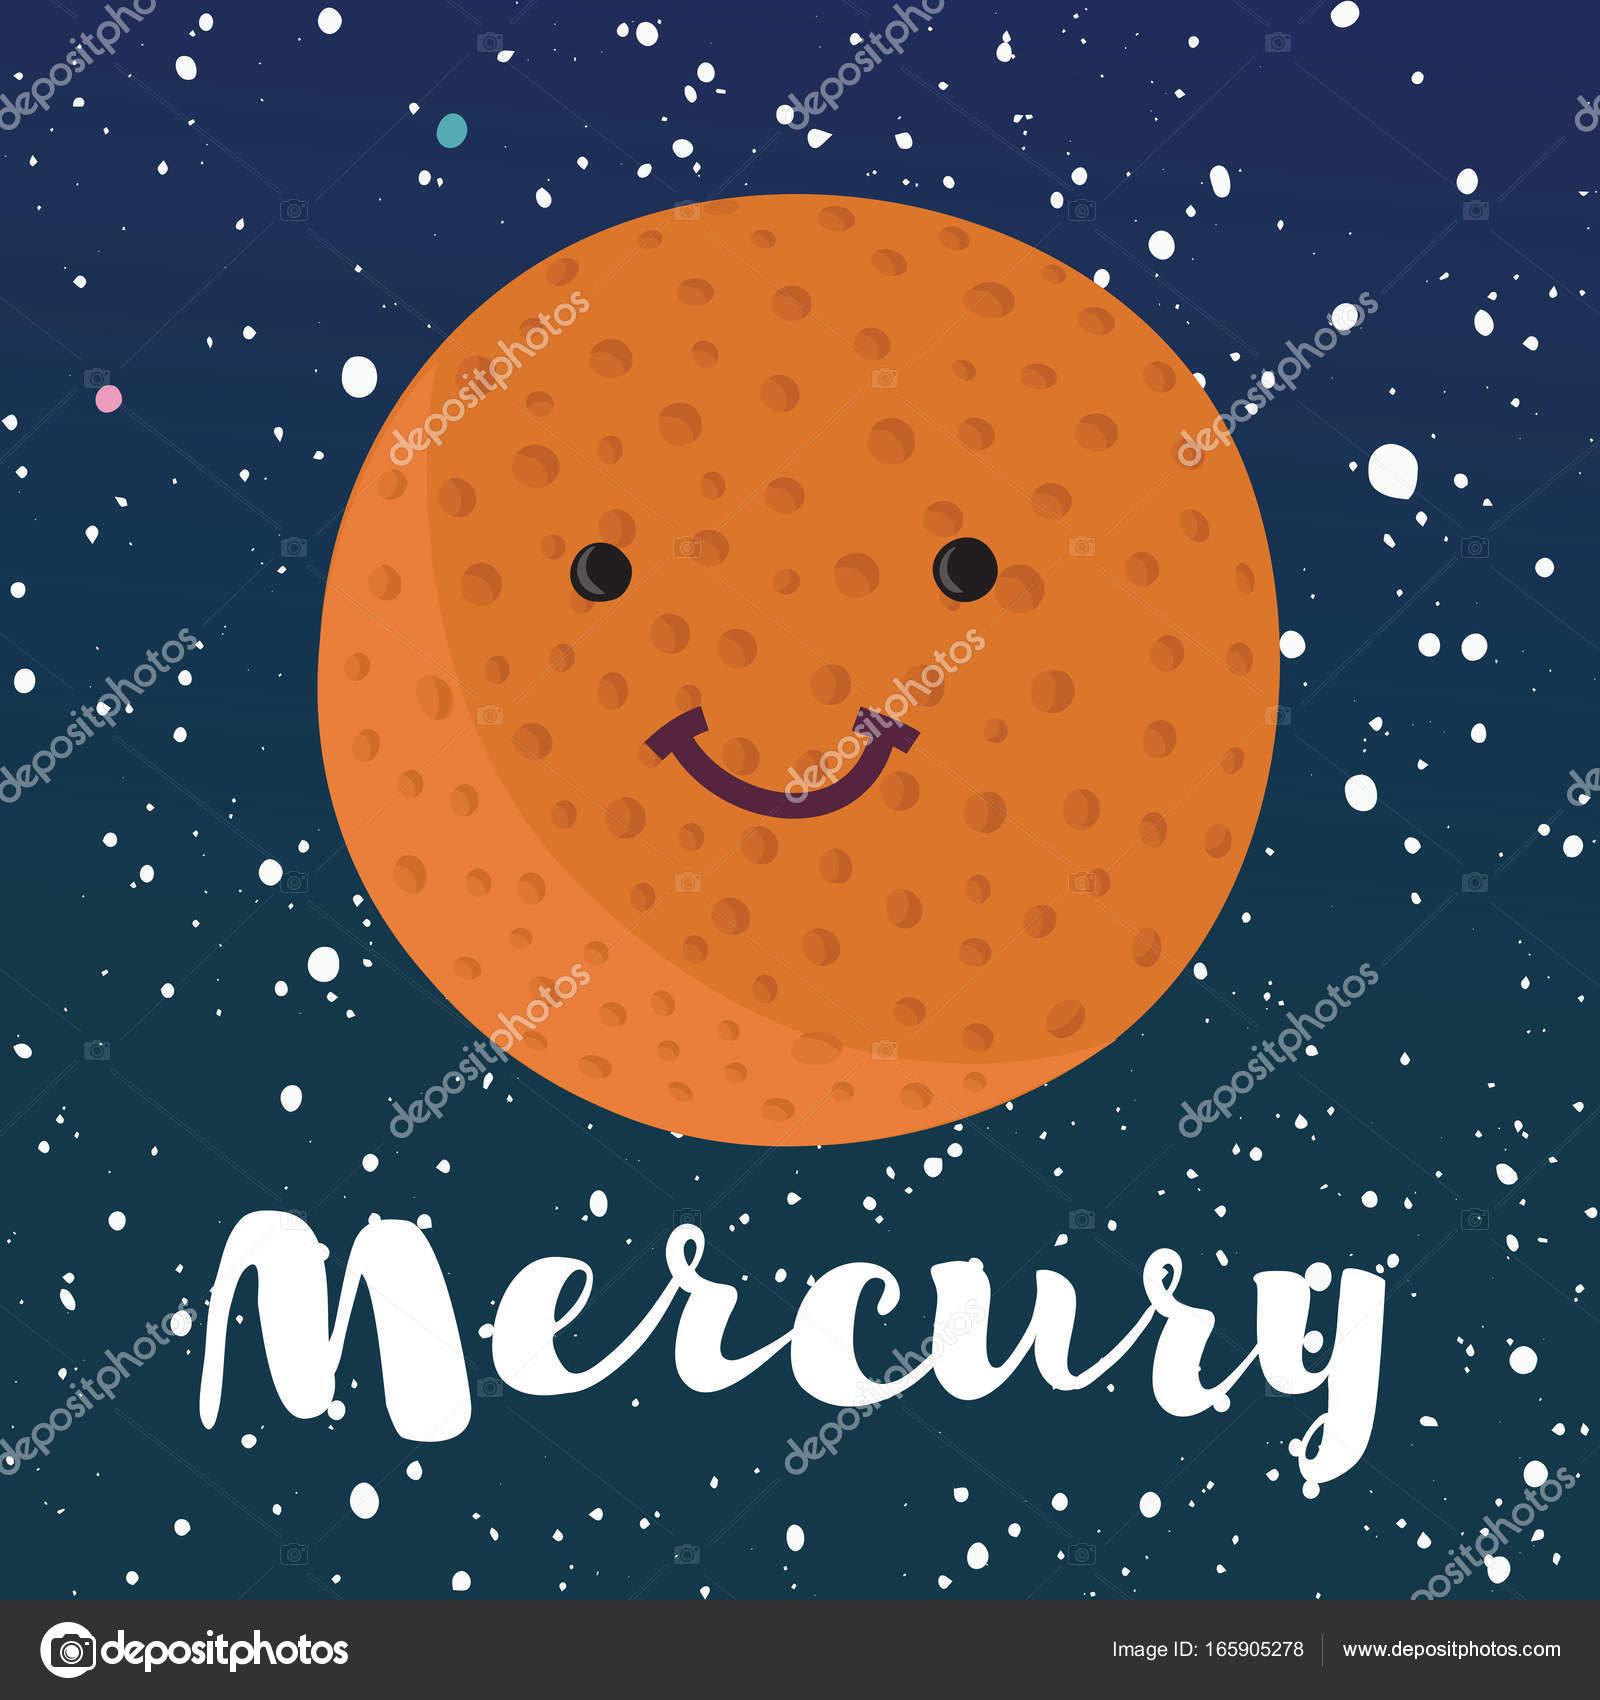 1600x1700 Vector Illustration Planet Mercury In Retro Flat Cartoon Style